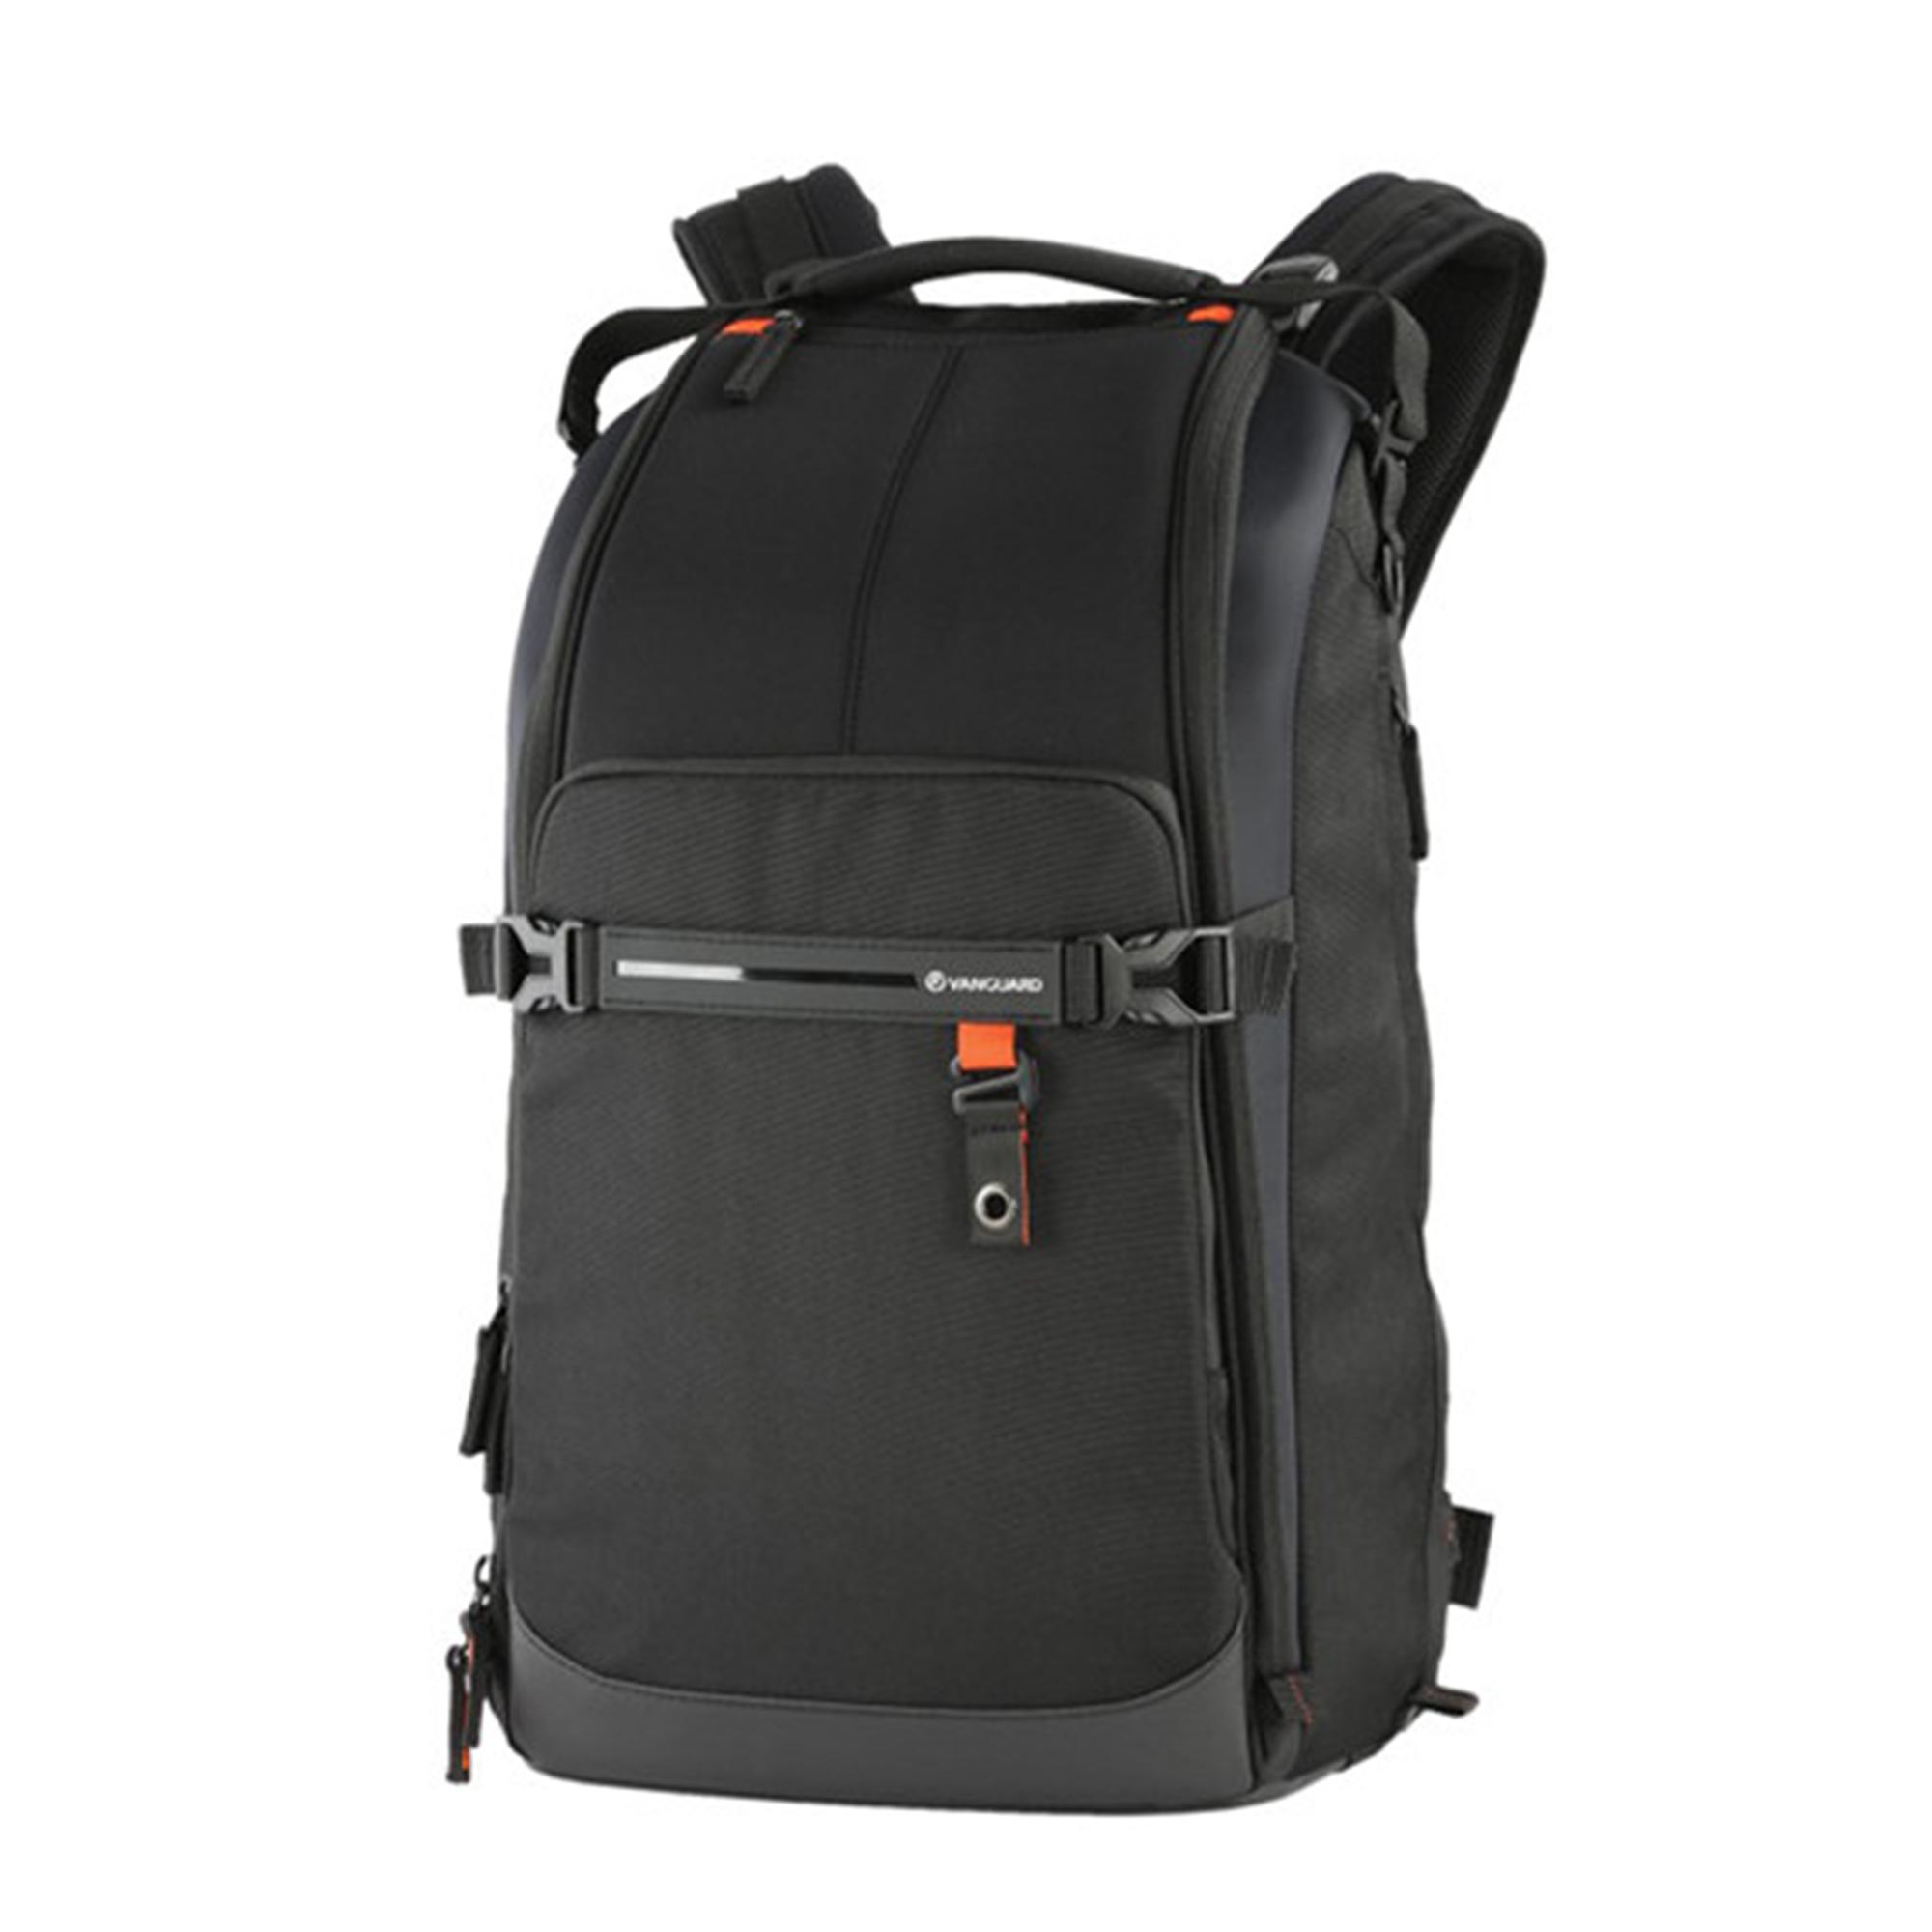 Vanguard Quovio 51 Backpack